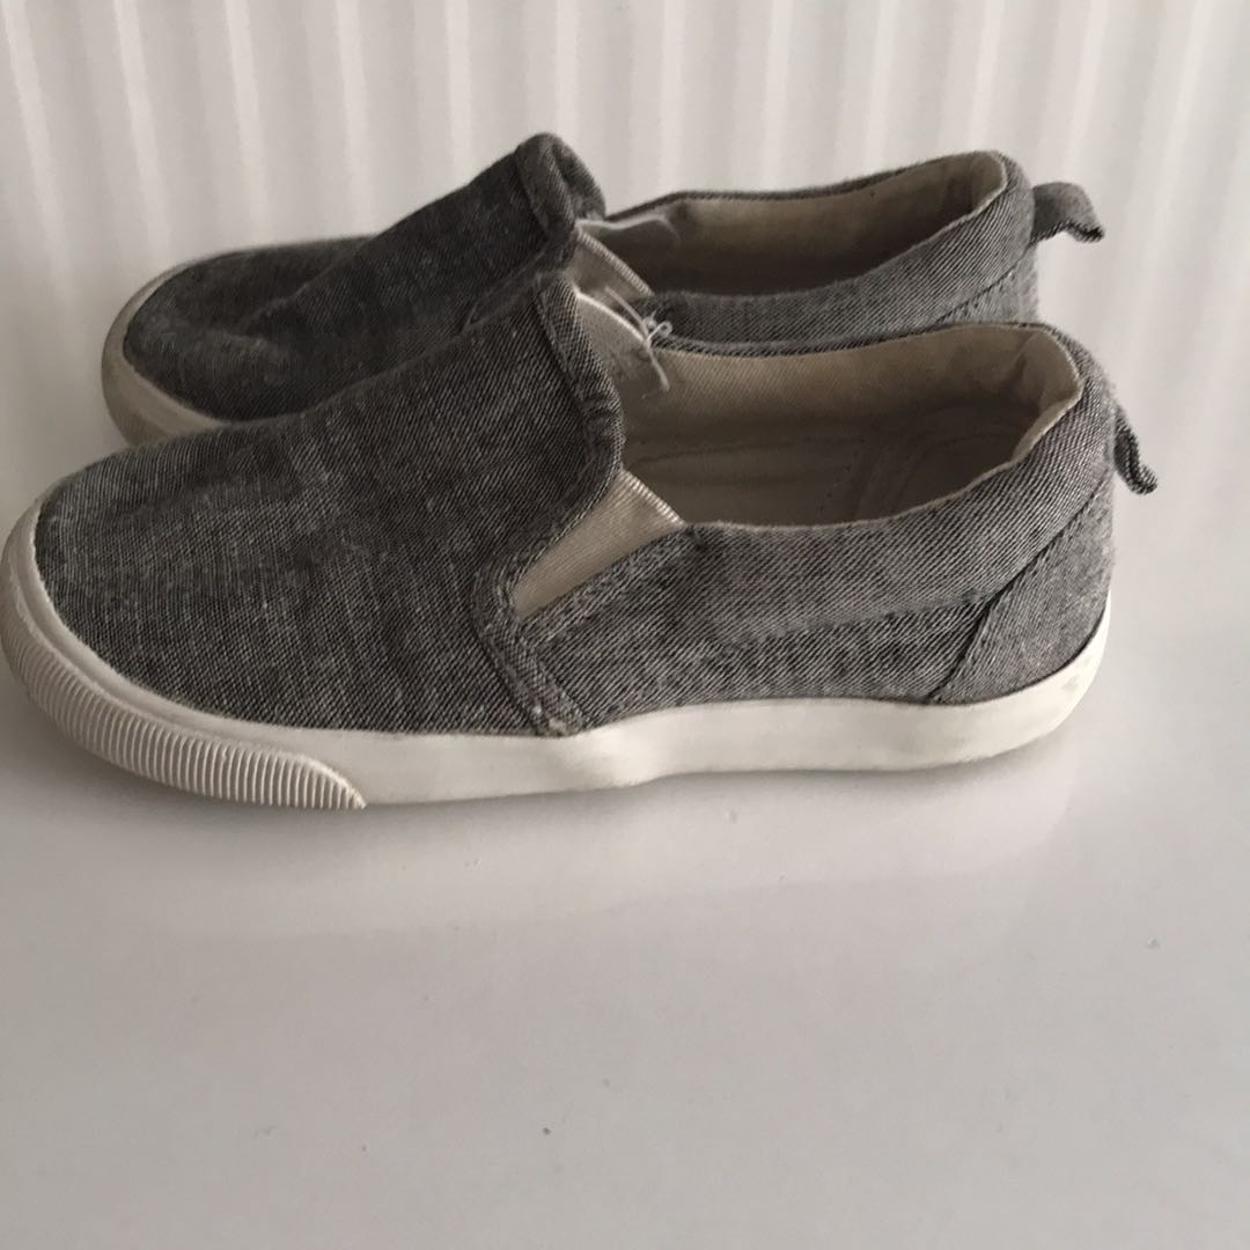 H&M Sandalet & Terlik